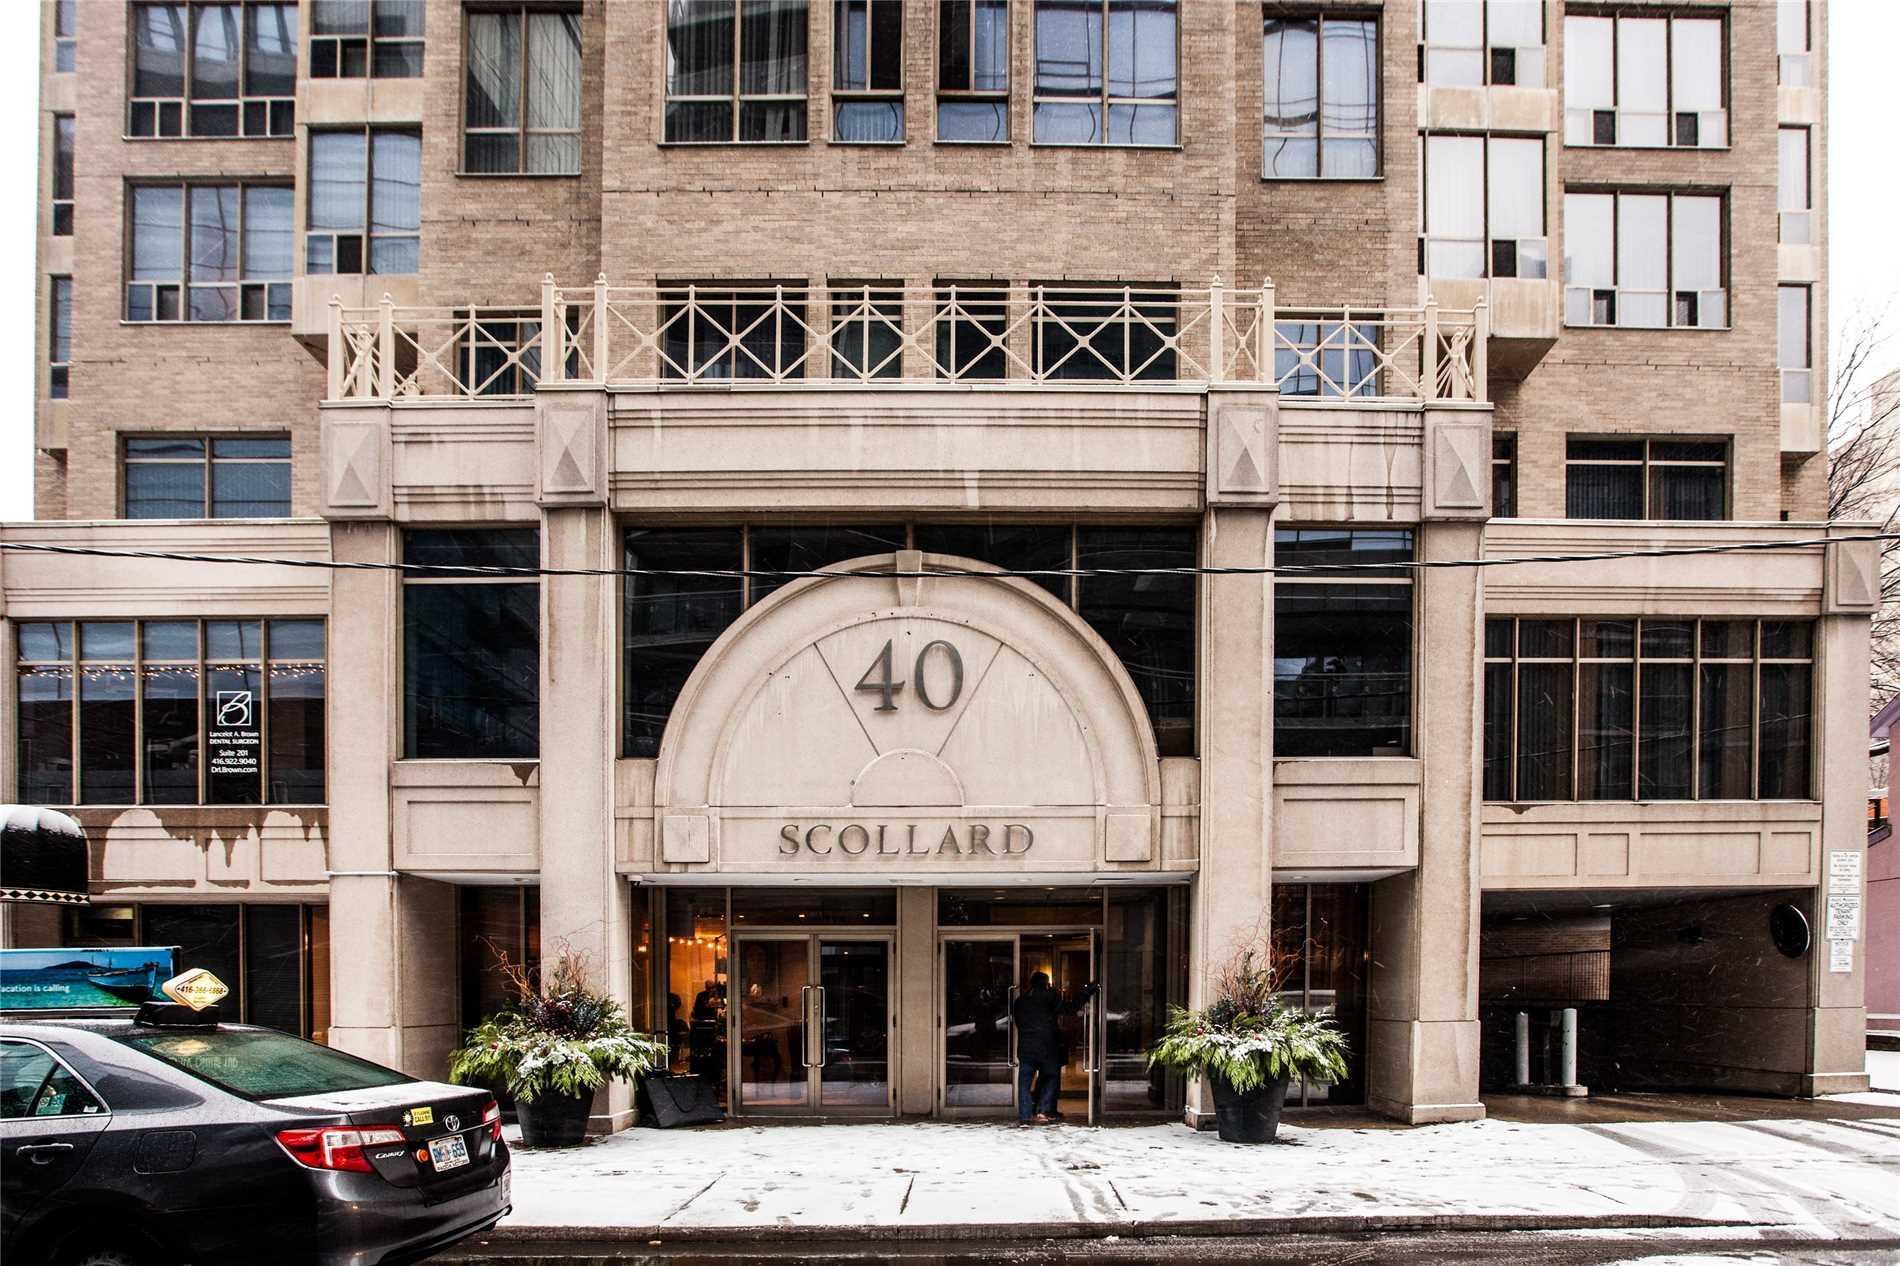 1001 - 40 Scollard St